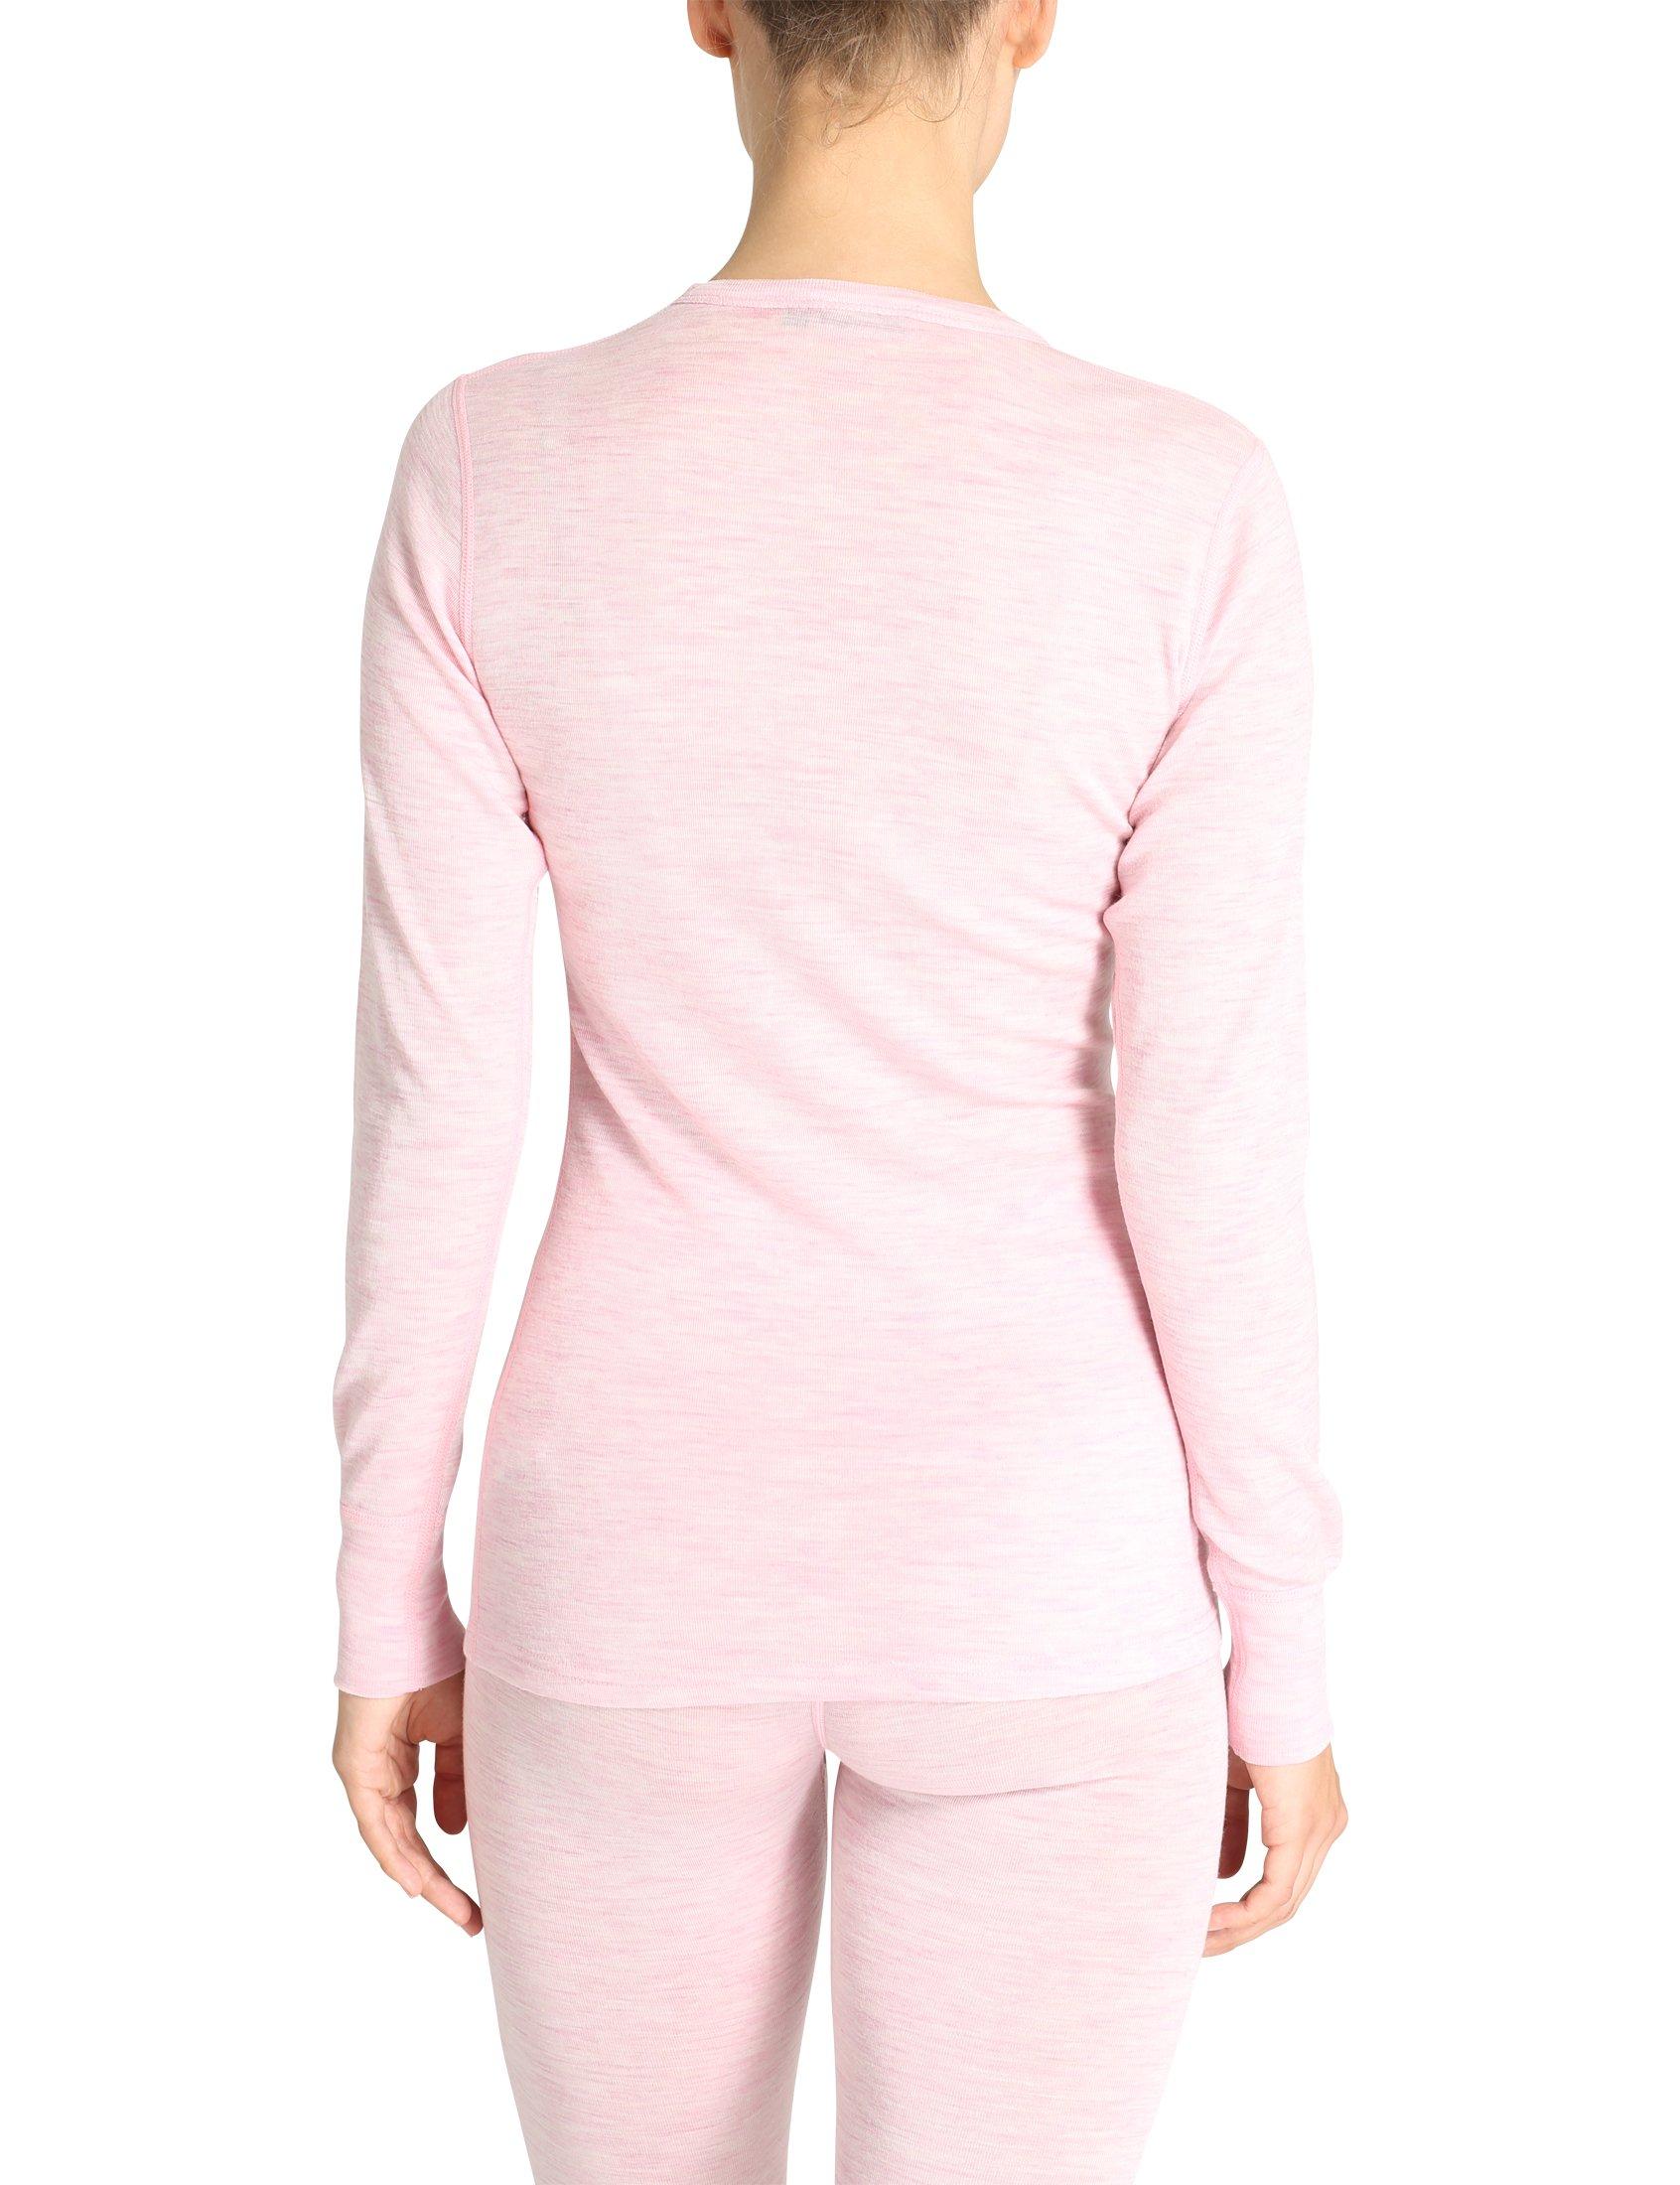 42e038538eb Ultrasport Pure Camiseta Interior Funcional, Mujer, Rosado, S ...